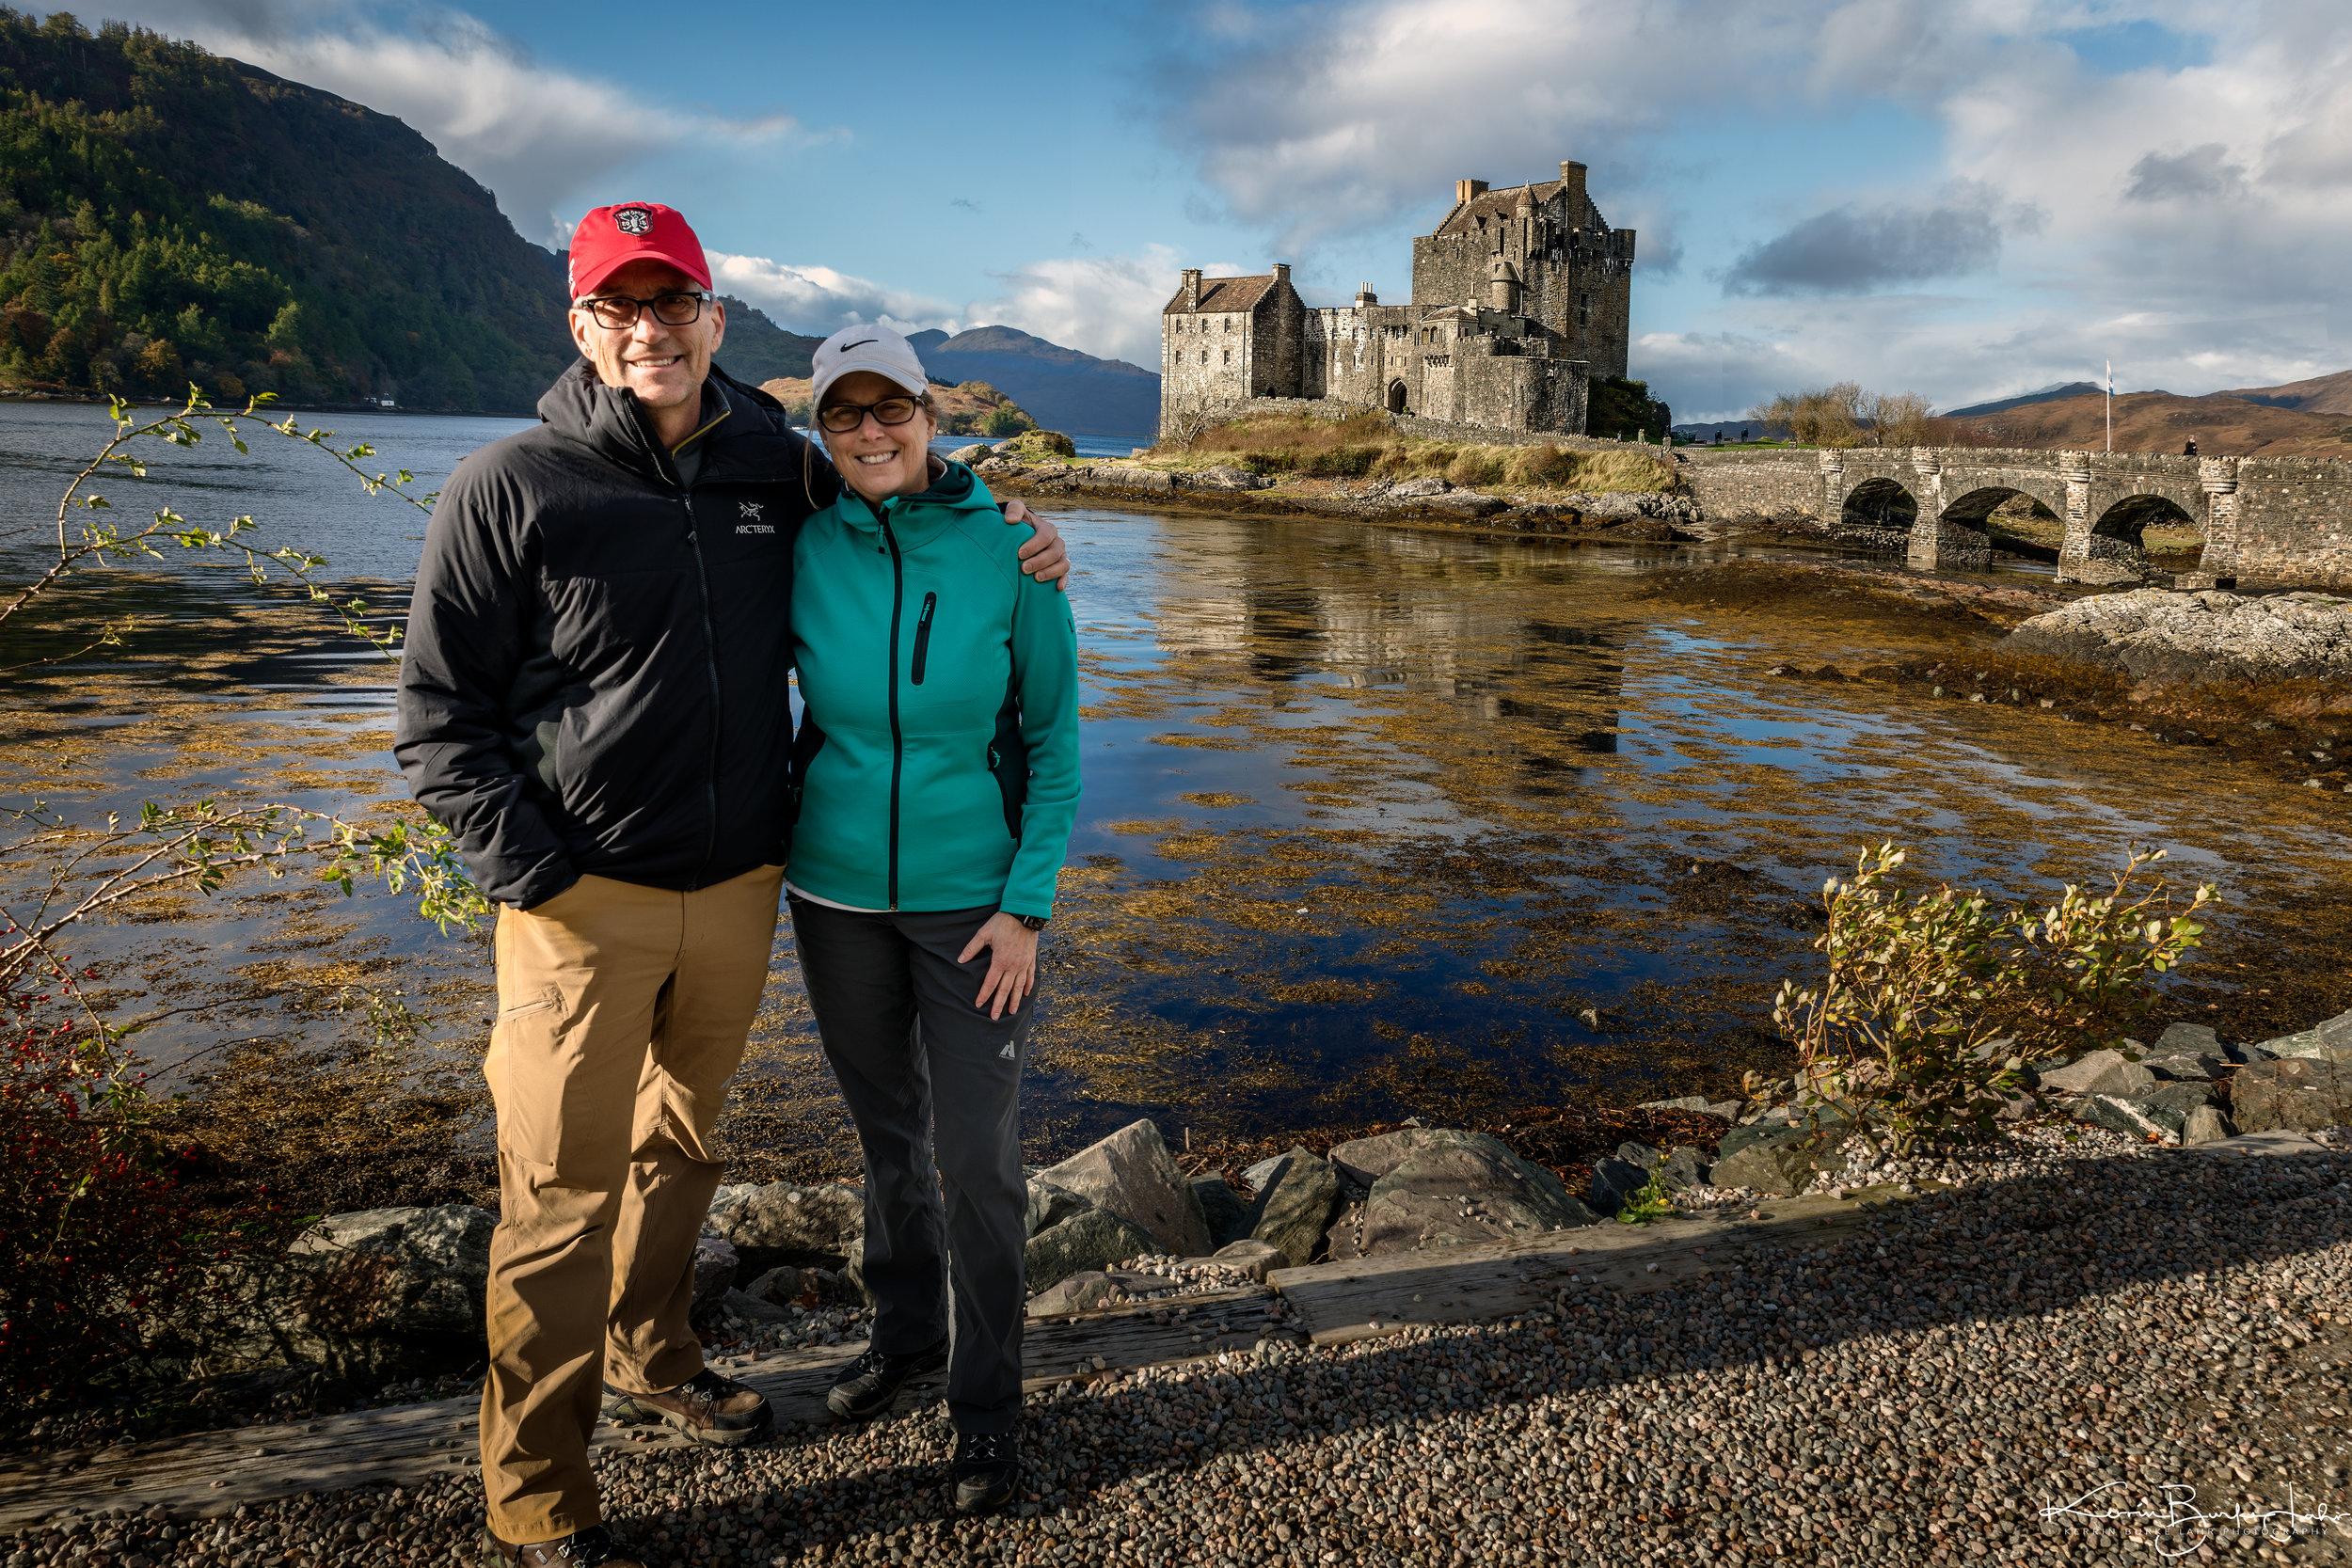 10-17-2018-Scottish-Highlands-6.jpg